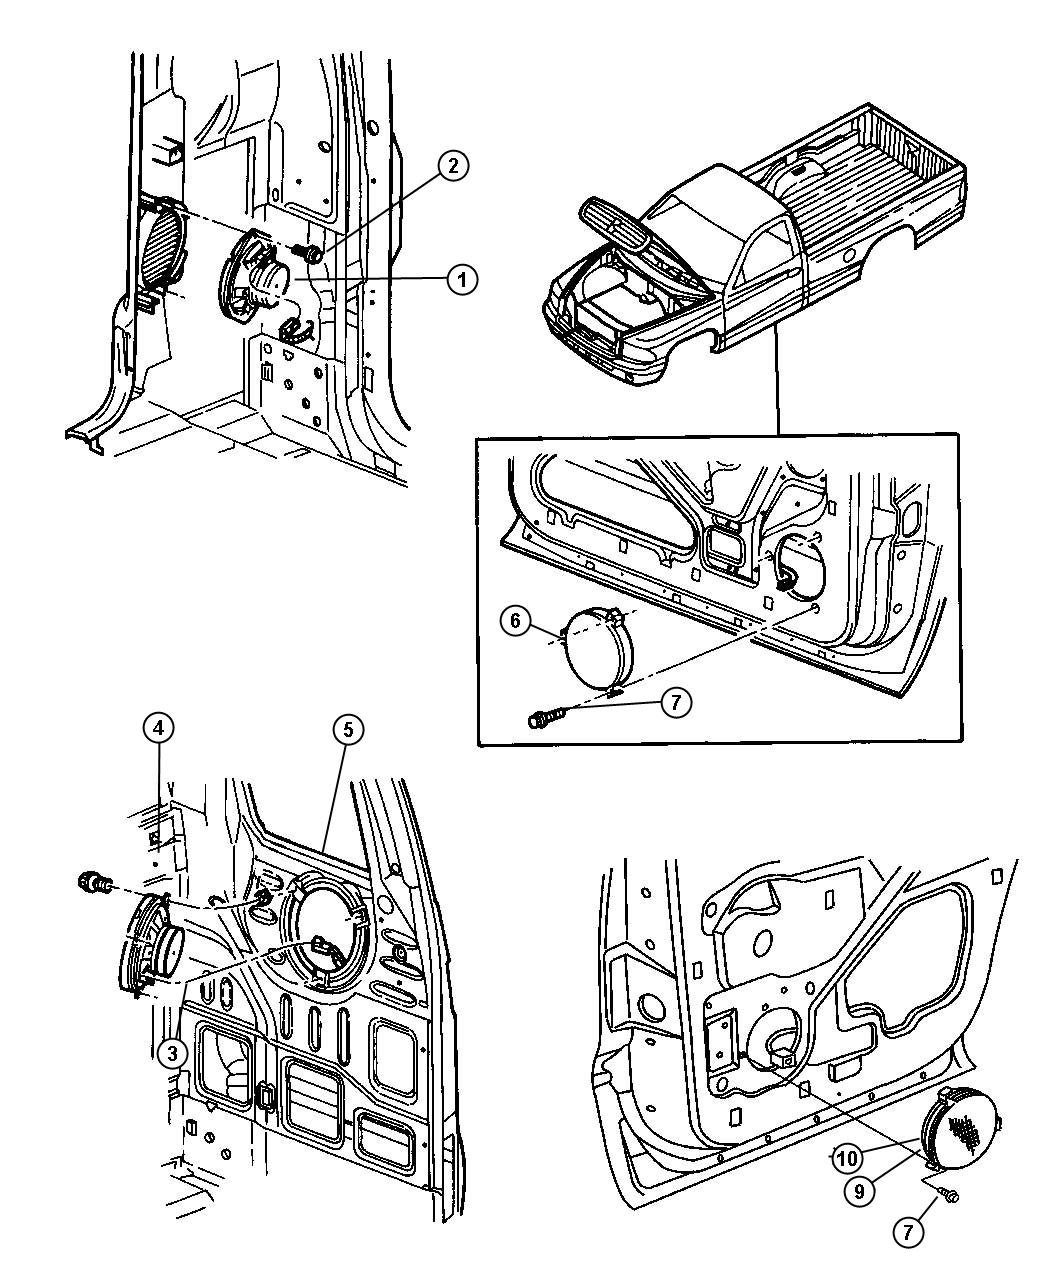 tags: #1997 infiniti q45 engine diagram#1997 infiniti q45 alternator#1997 infiniti  q45 green#infiniti q45 specs#1997 infiniti q45 rims#infiniti q45 s13#2002